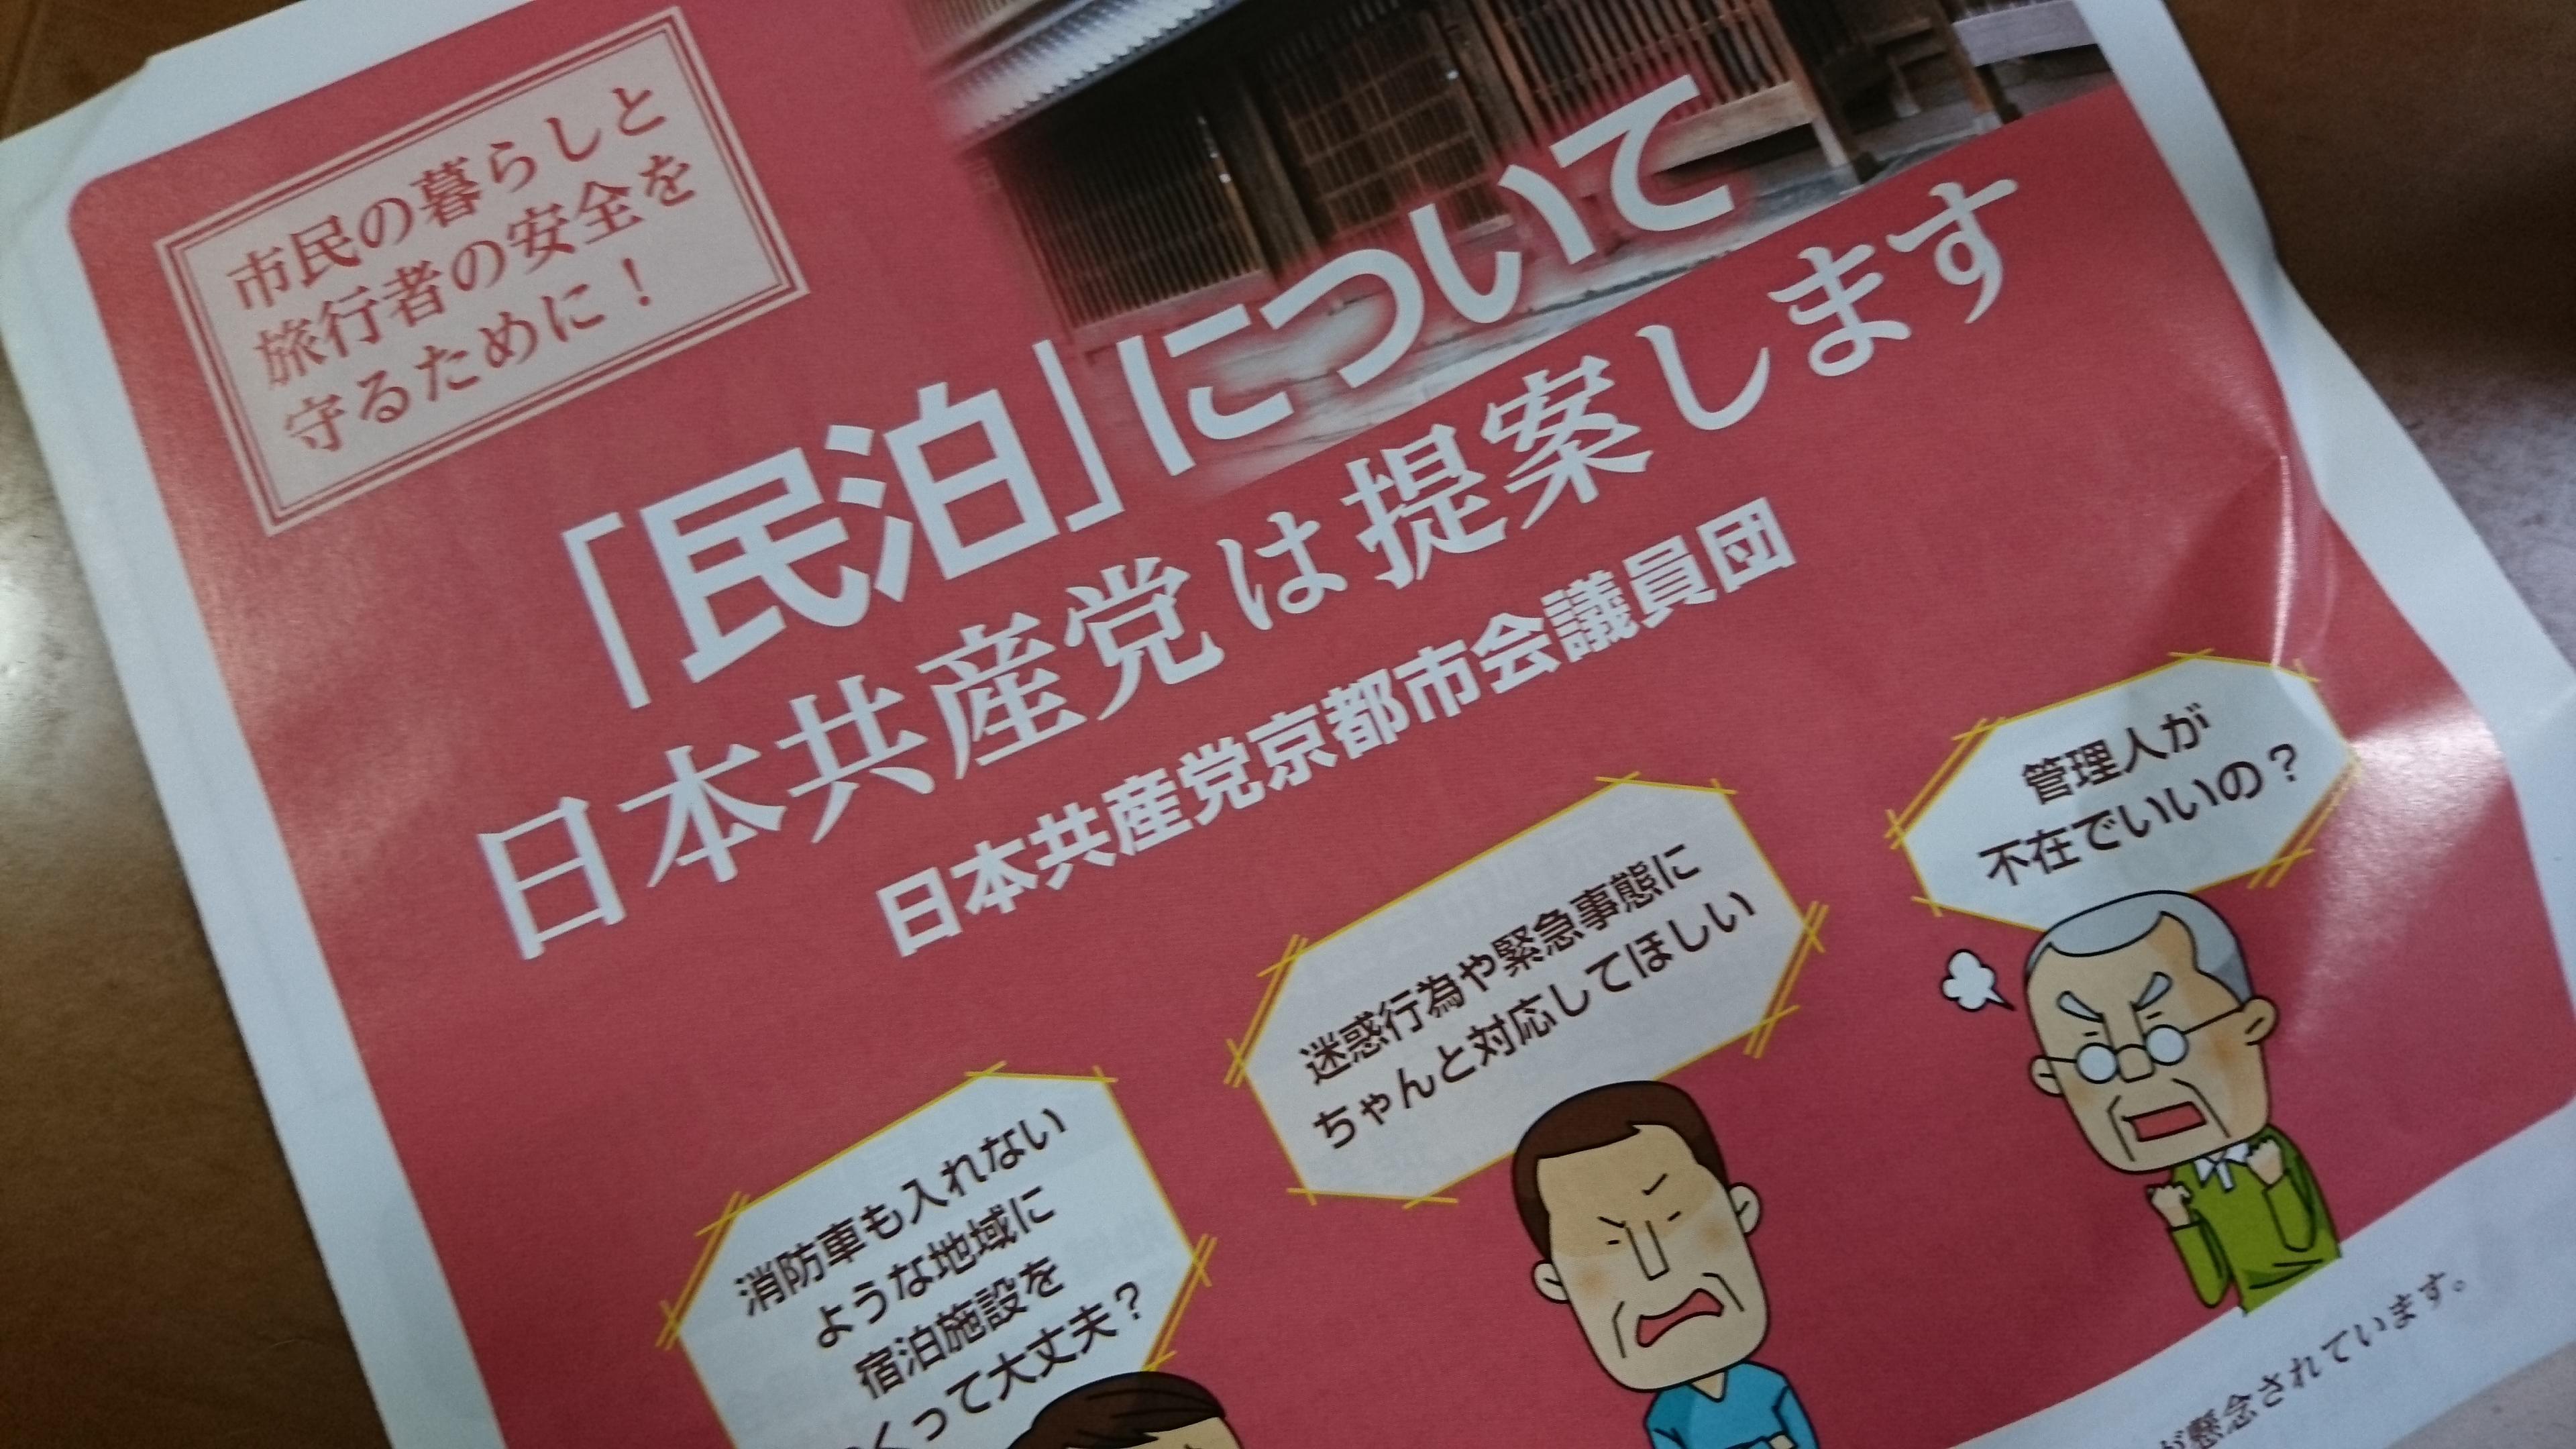 http://www.inoue-satoshi.com/diary/DSC_0618%5B1%5D.JPG